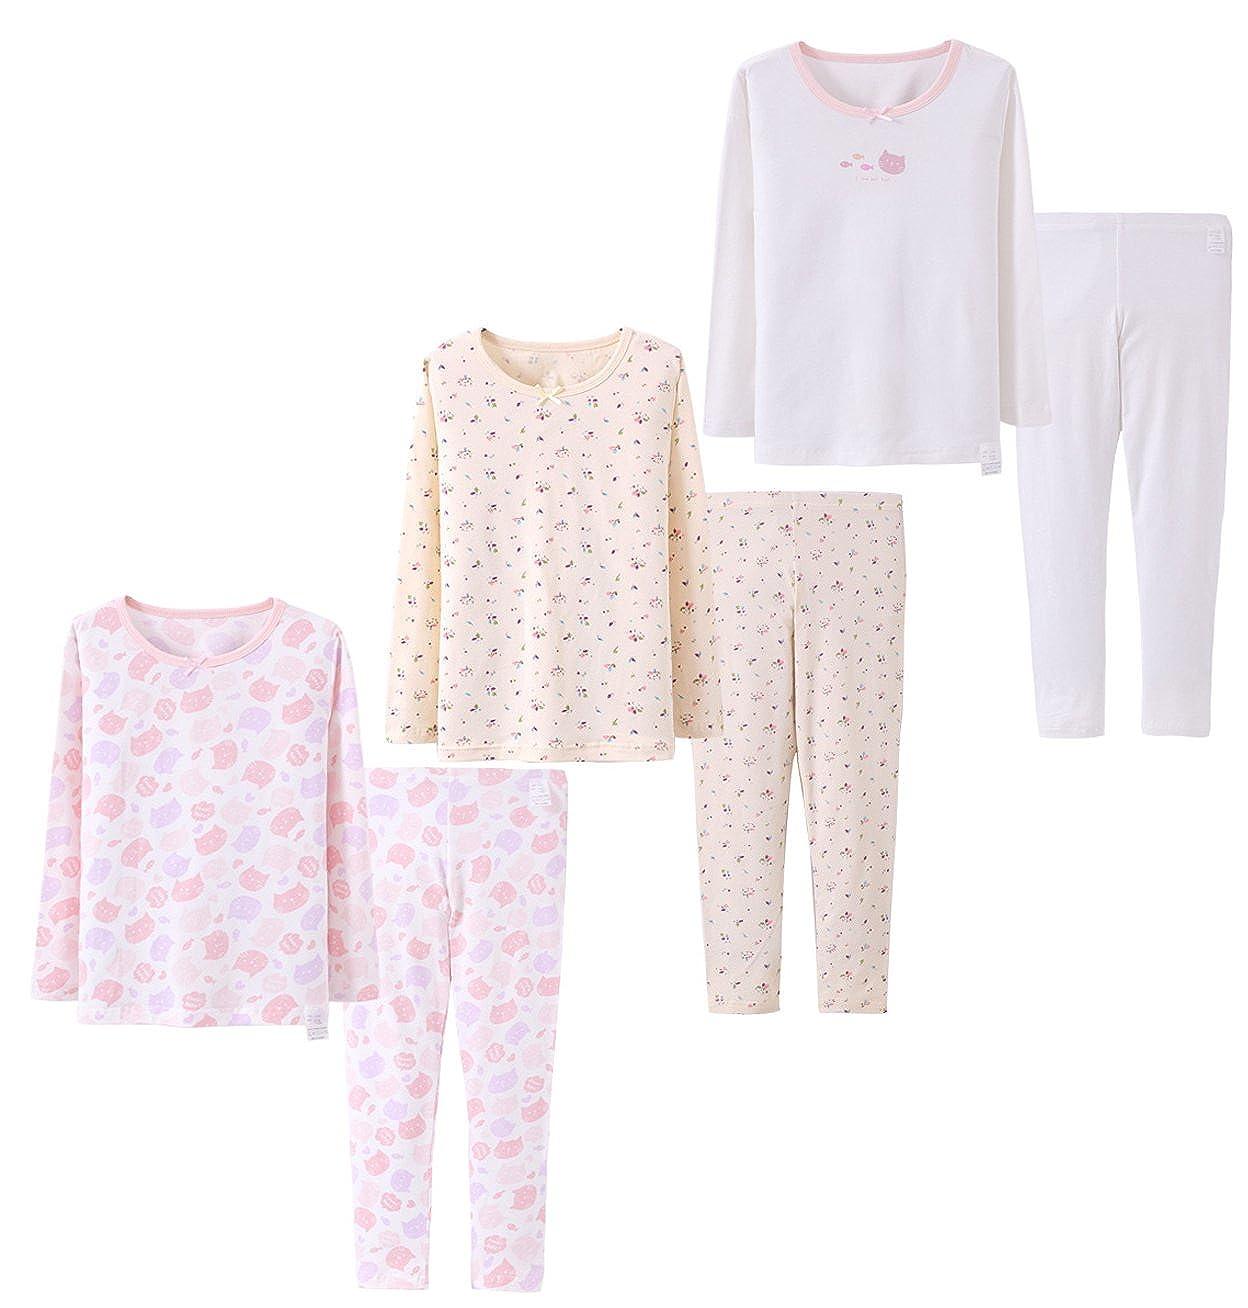 Abalacoco Big Girls Boys 3 Sets (6pcs) Cotton Longs sleeve Undershirts Autumn Winter Thermal Underwear Pants Suit 4-10T